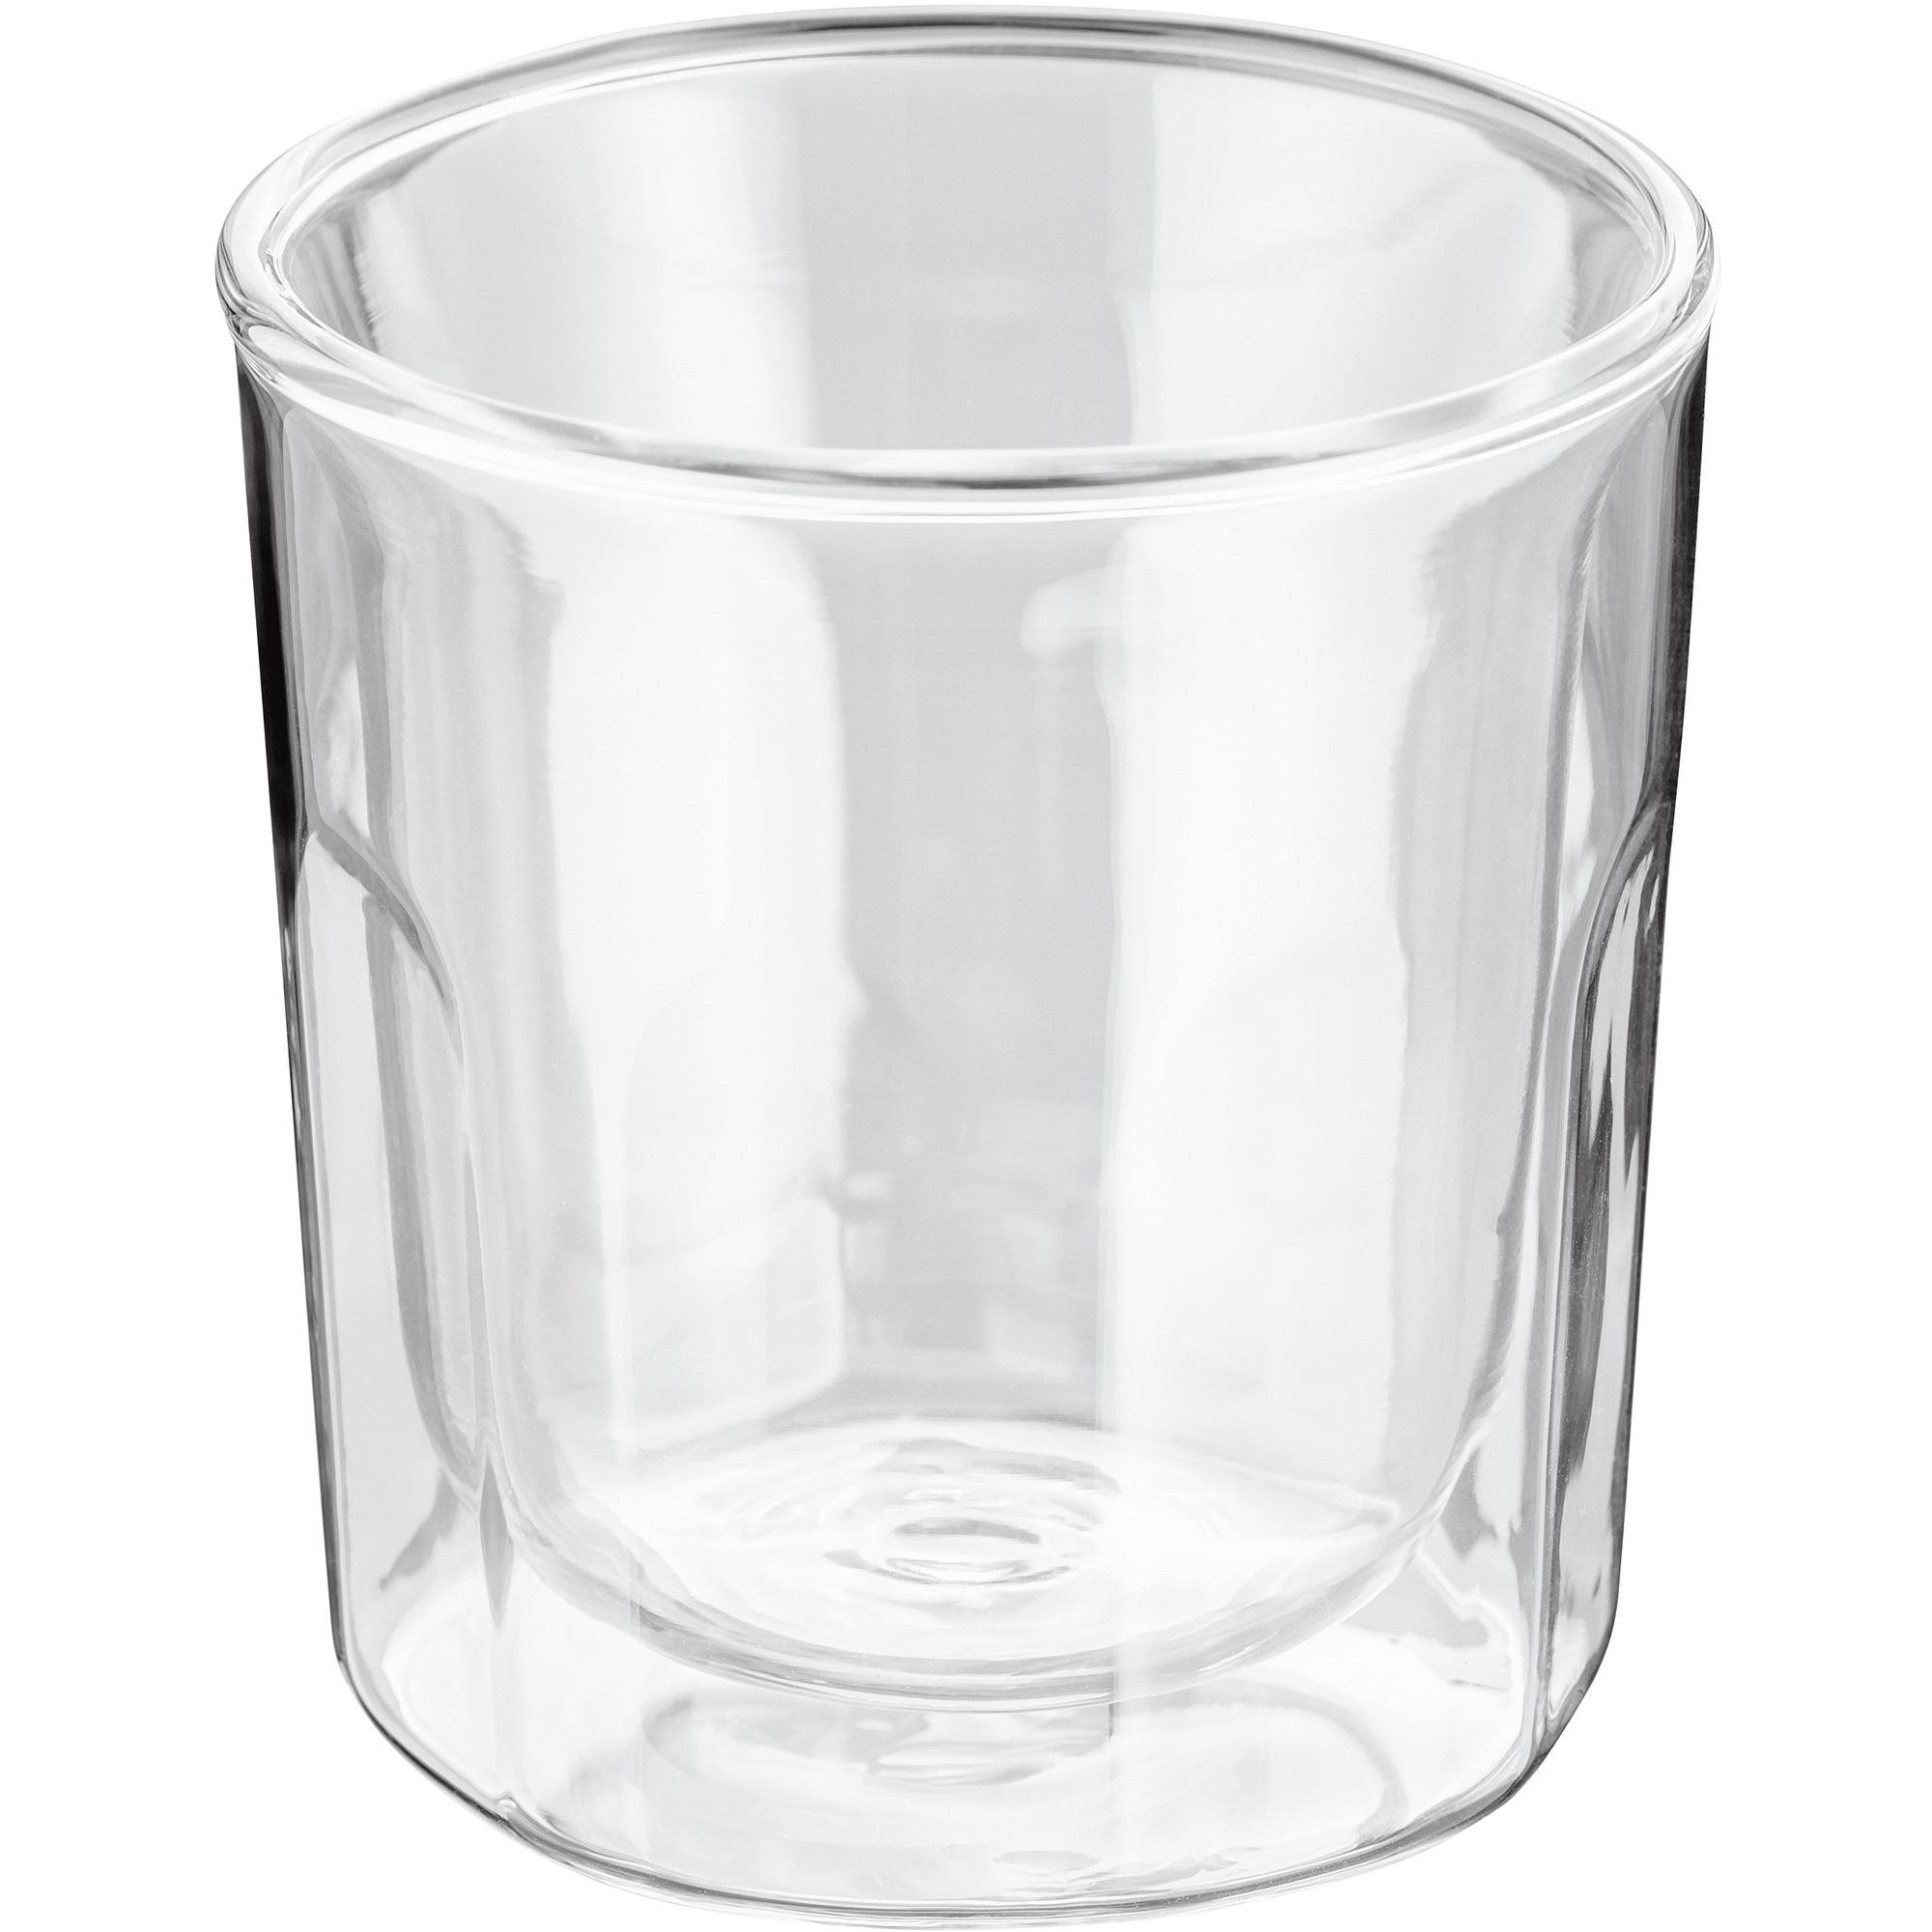 Horwood Dubbelväggat glas 300 ml 2 st